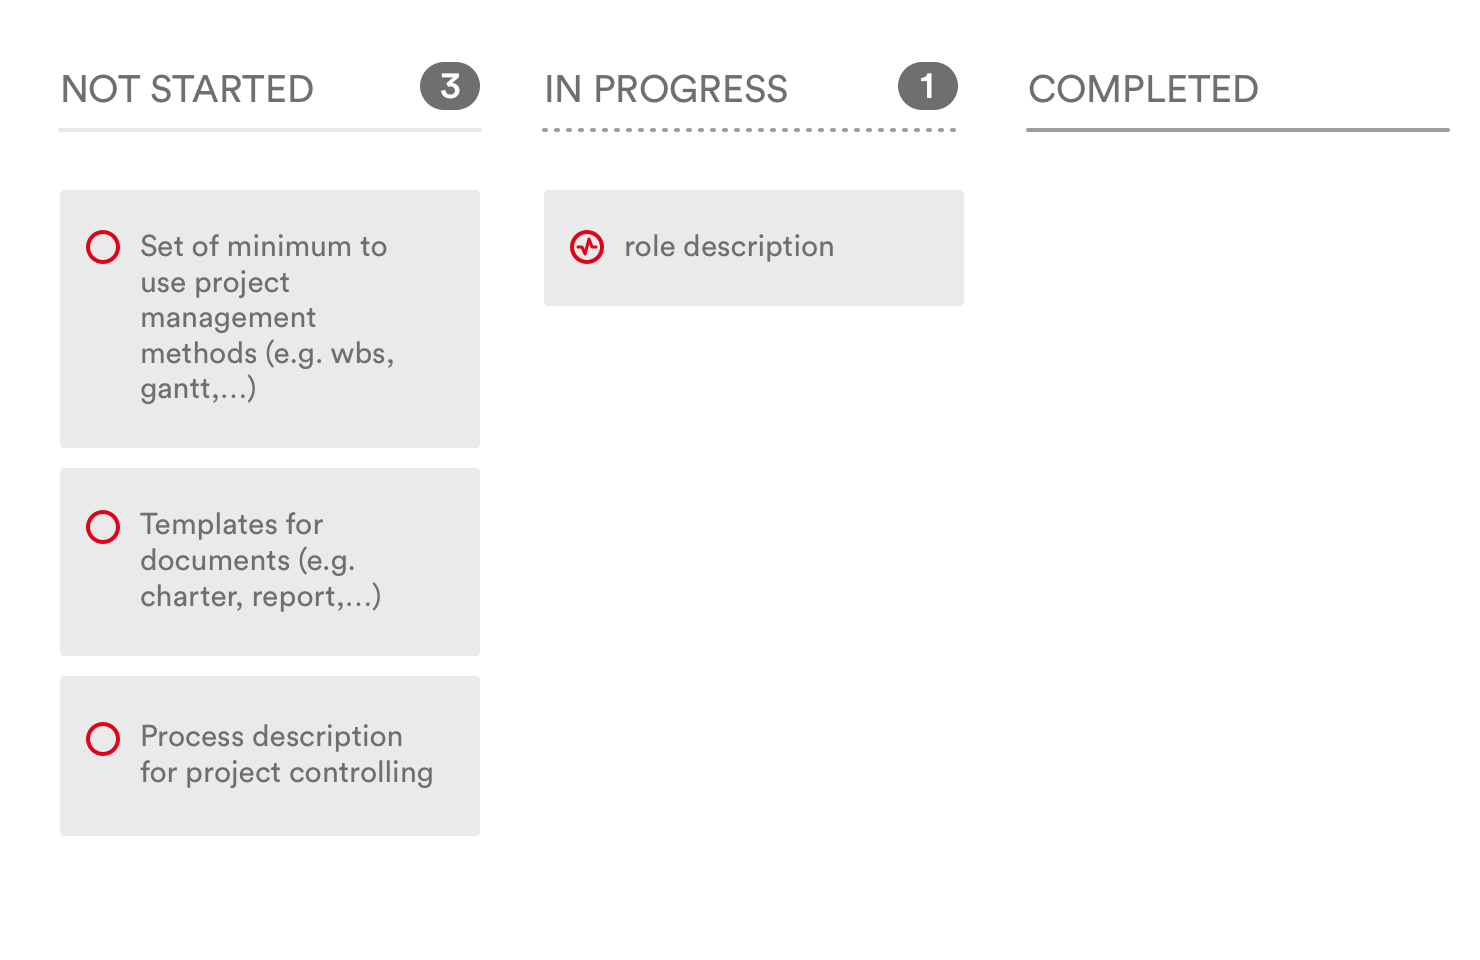 PMCC-A good way to measure progress: the Kanban board